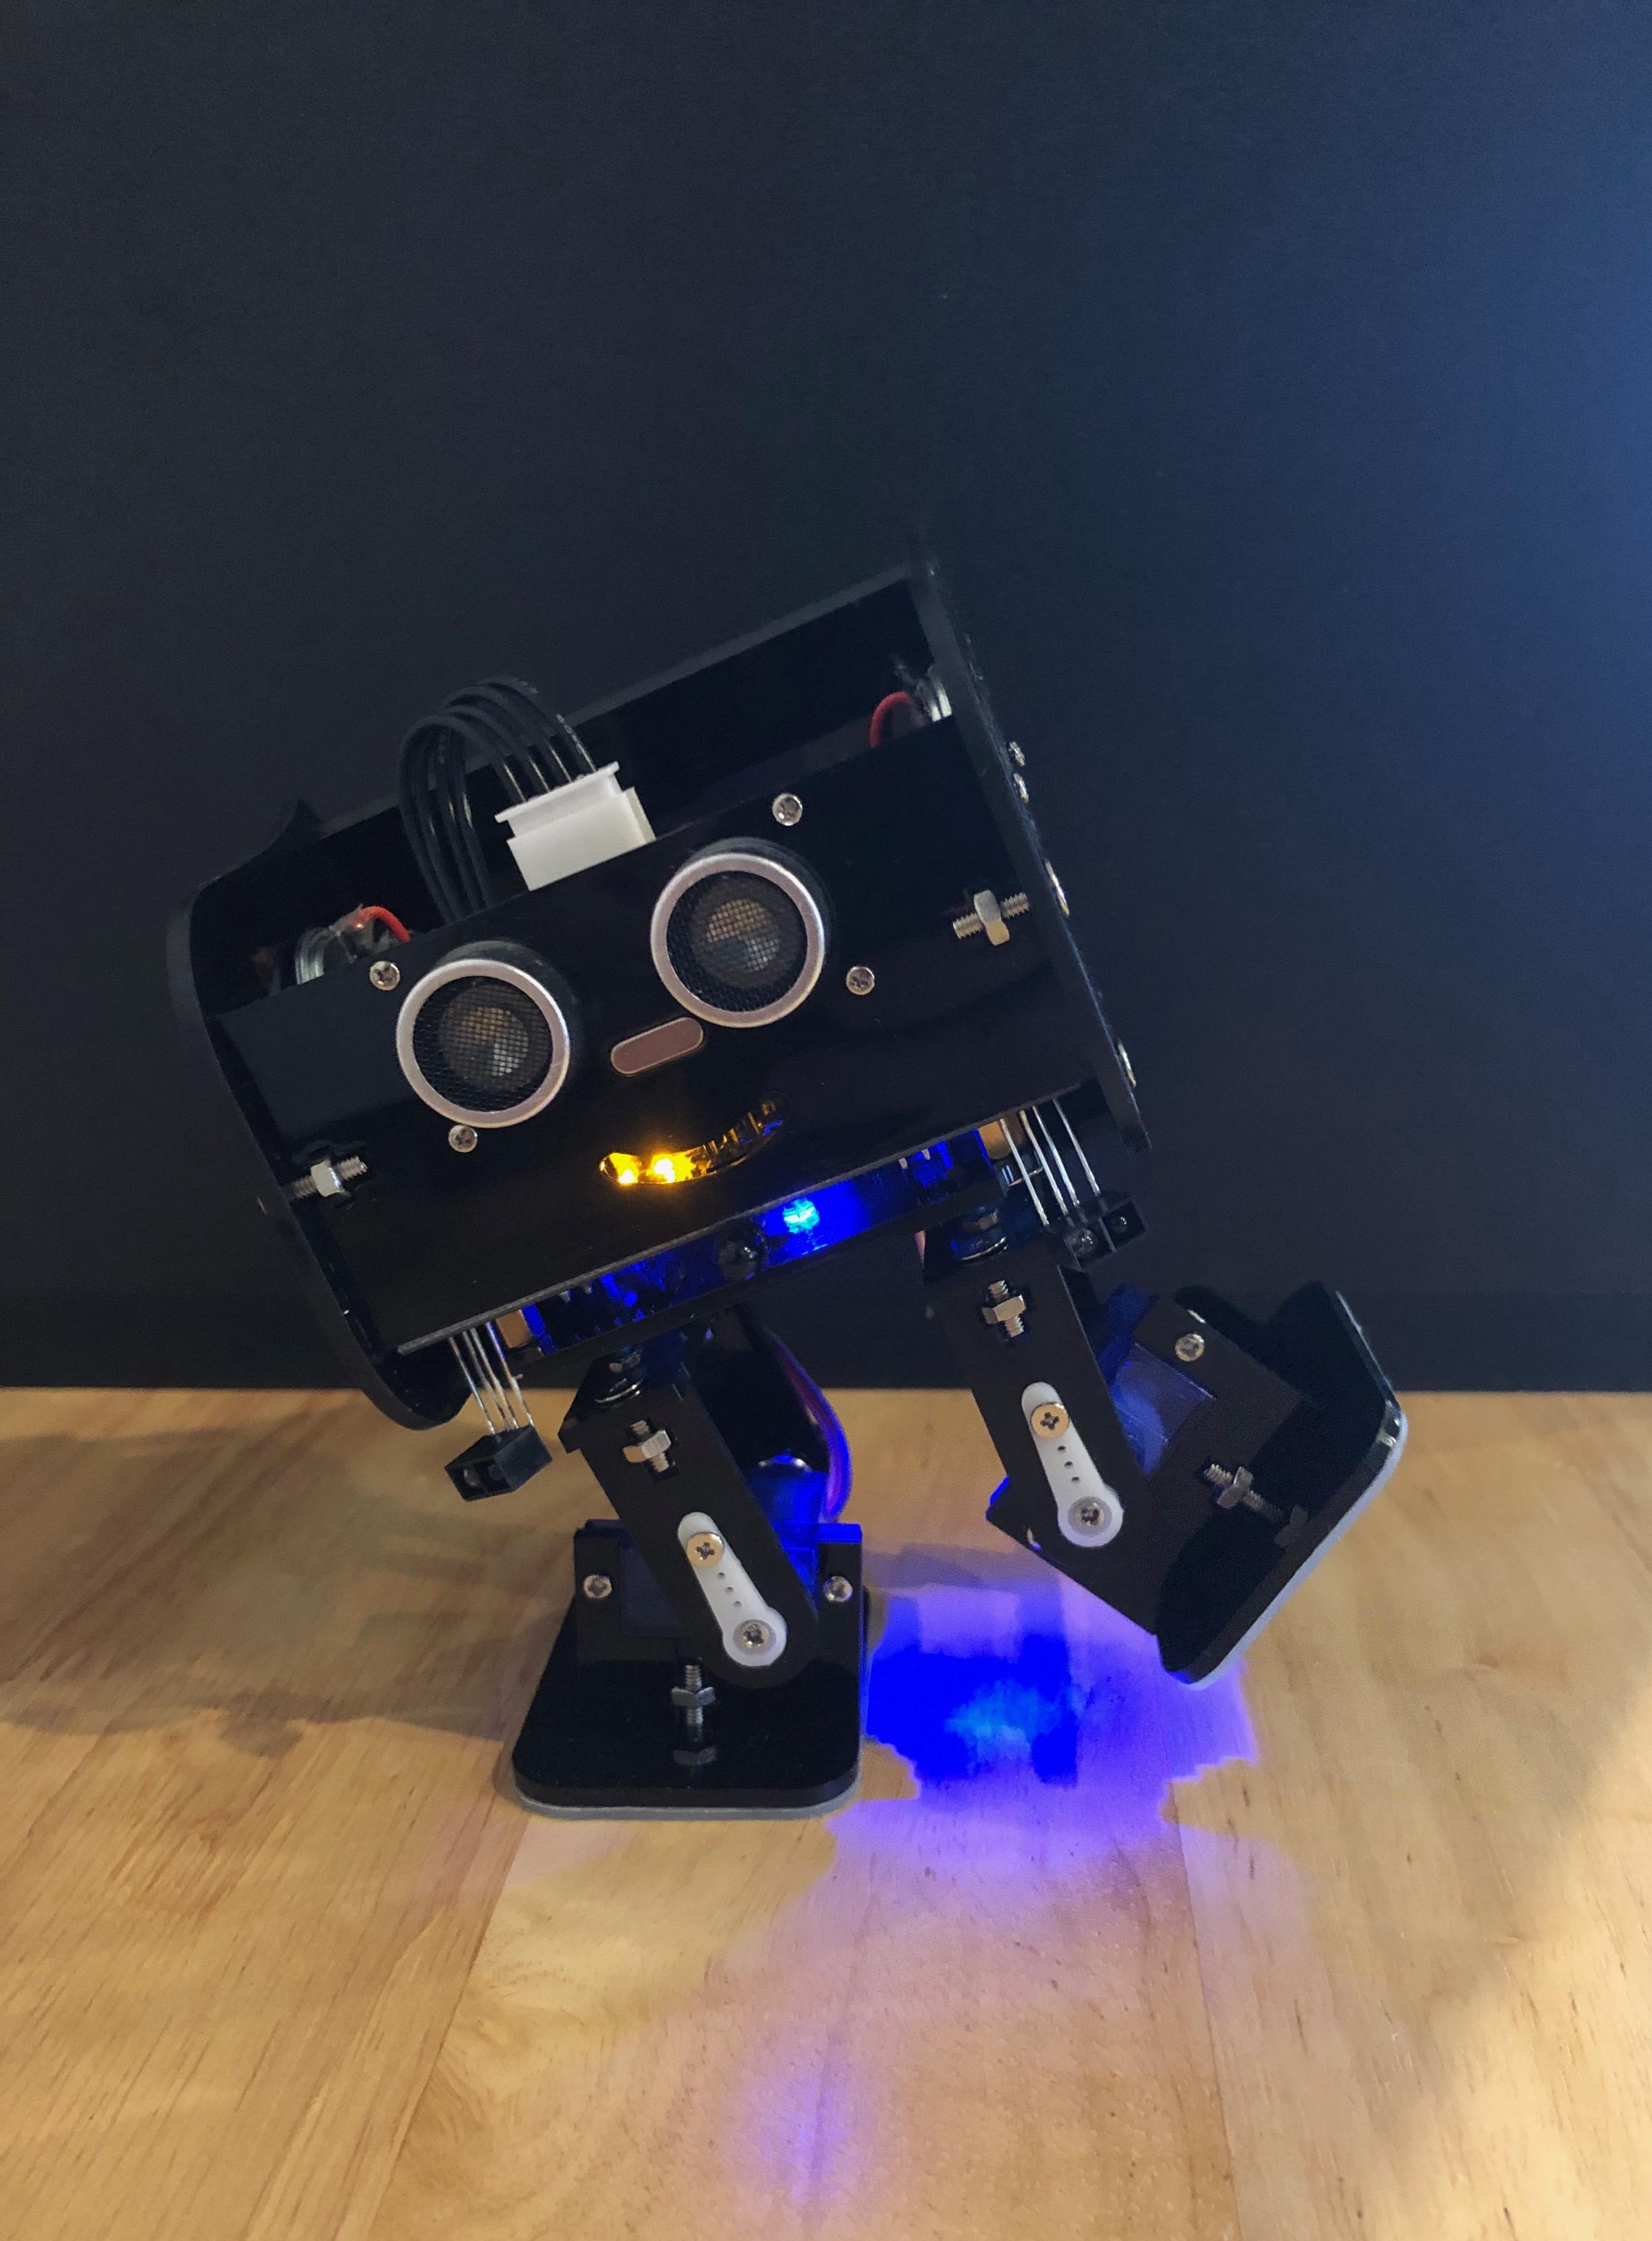 A Black, bipedal Arduino-based robot dancing